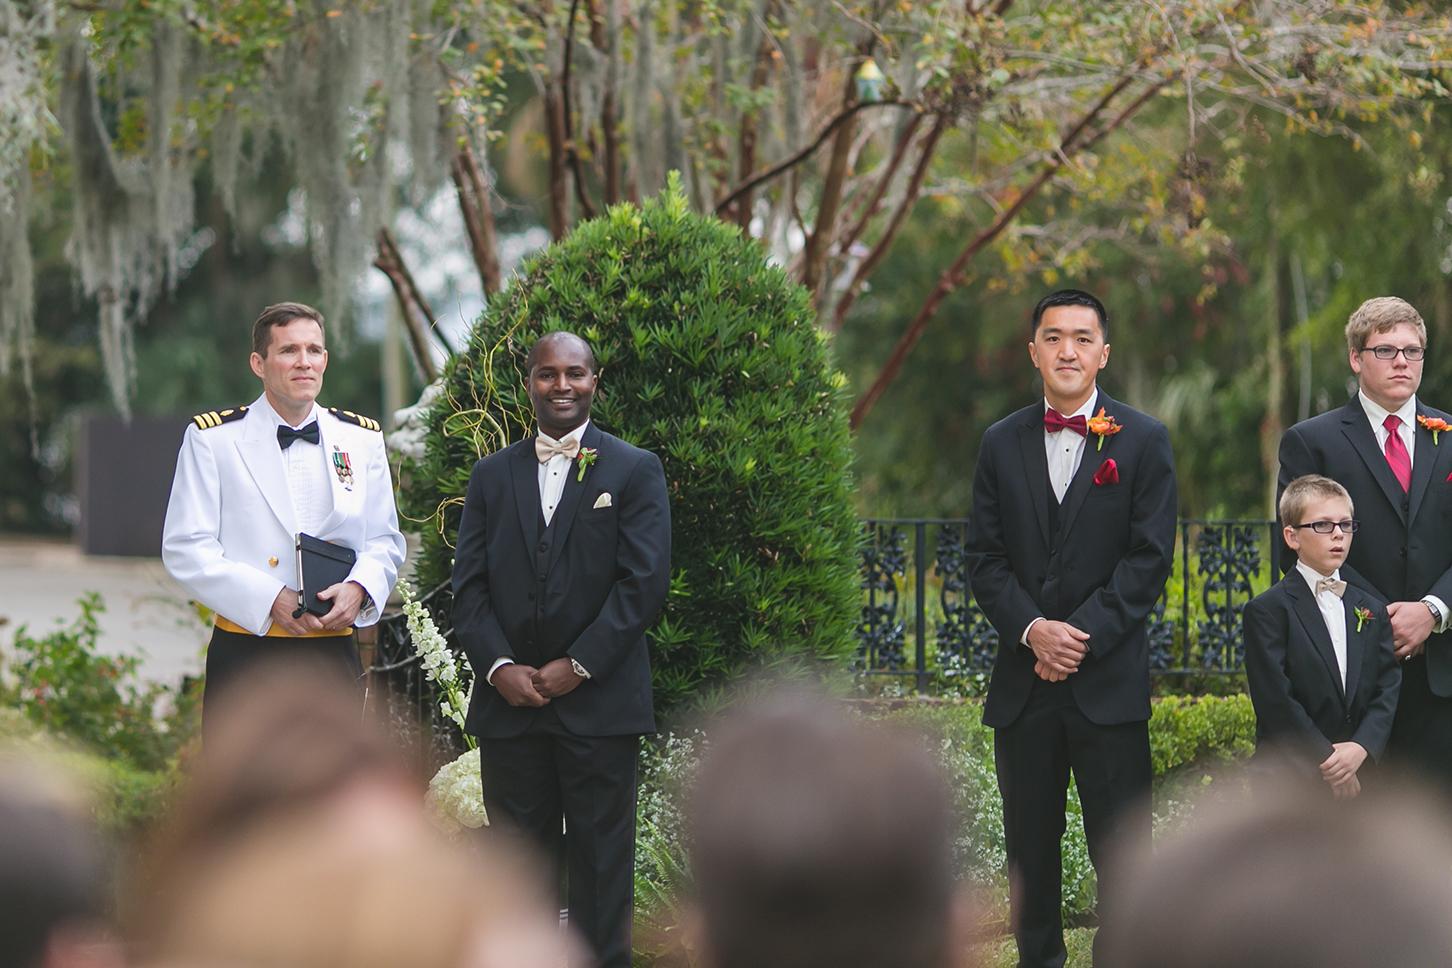 adam-szarmack-riverside-jacksonville-wedding-photographer-2PZ3A4906.jpg